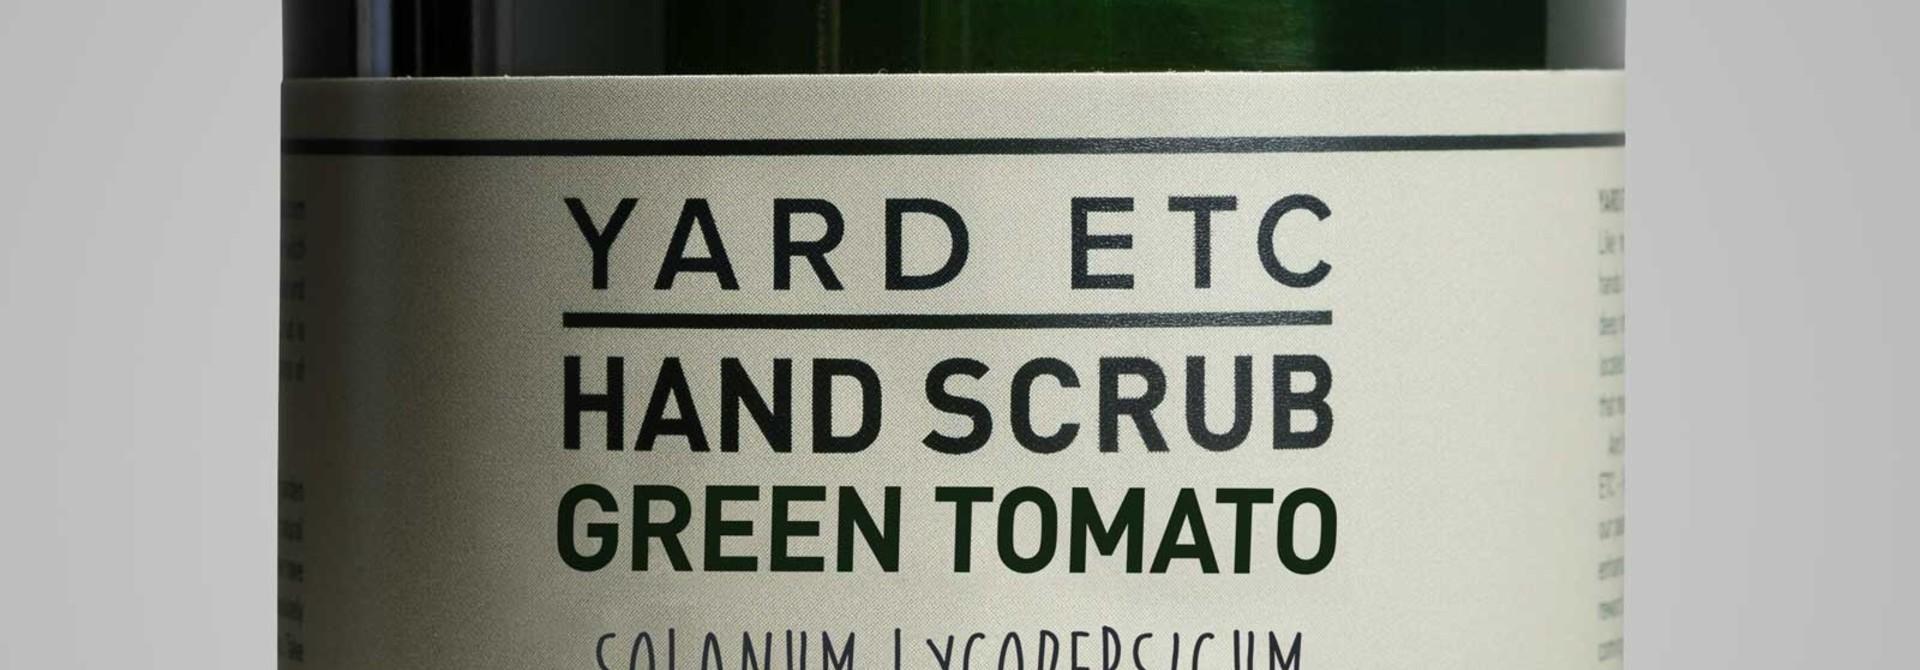 Hand Scrub - Green Tomato